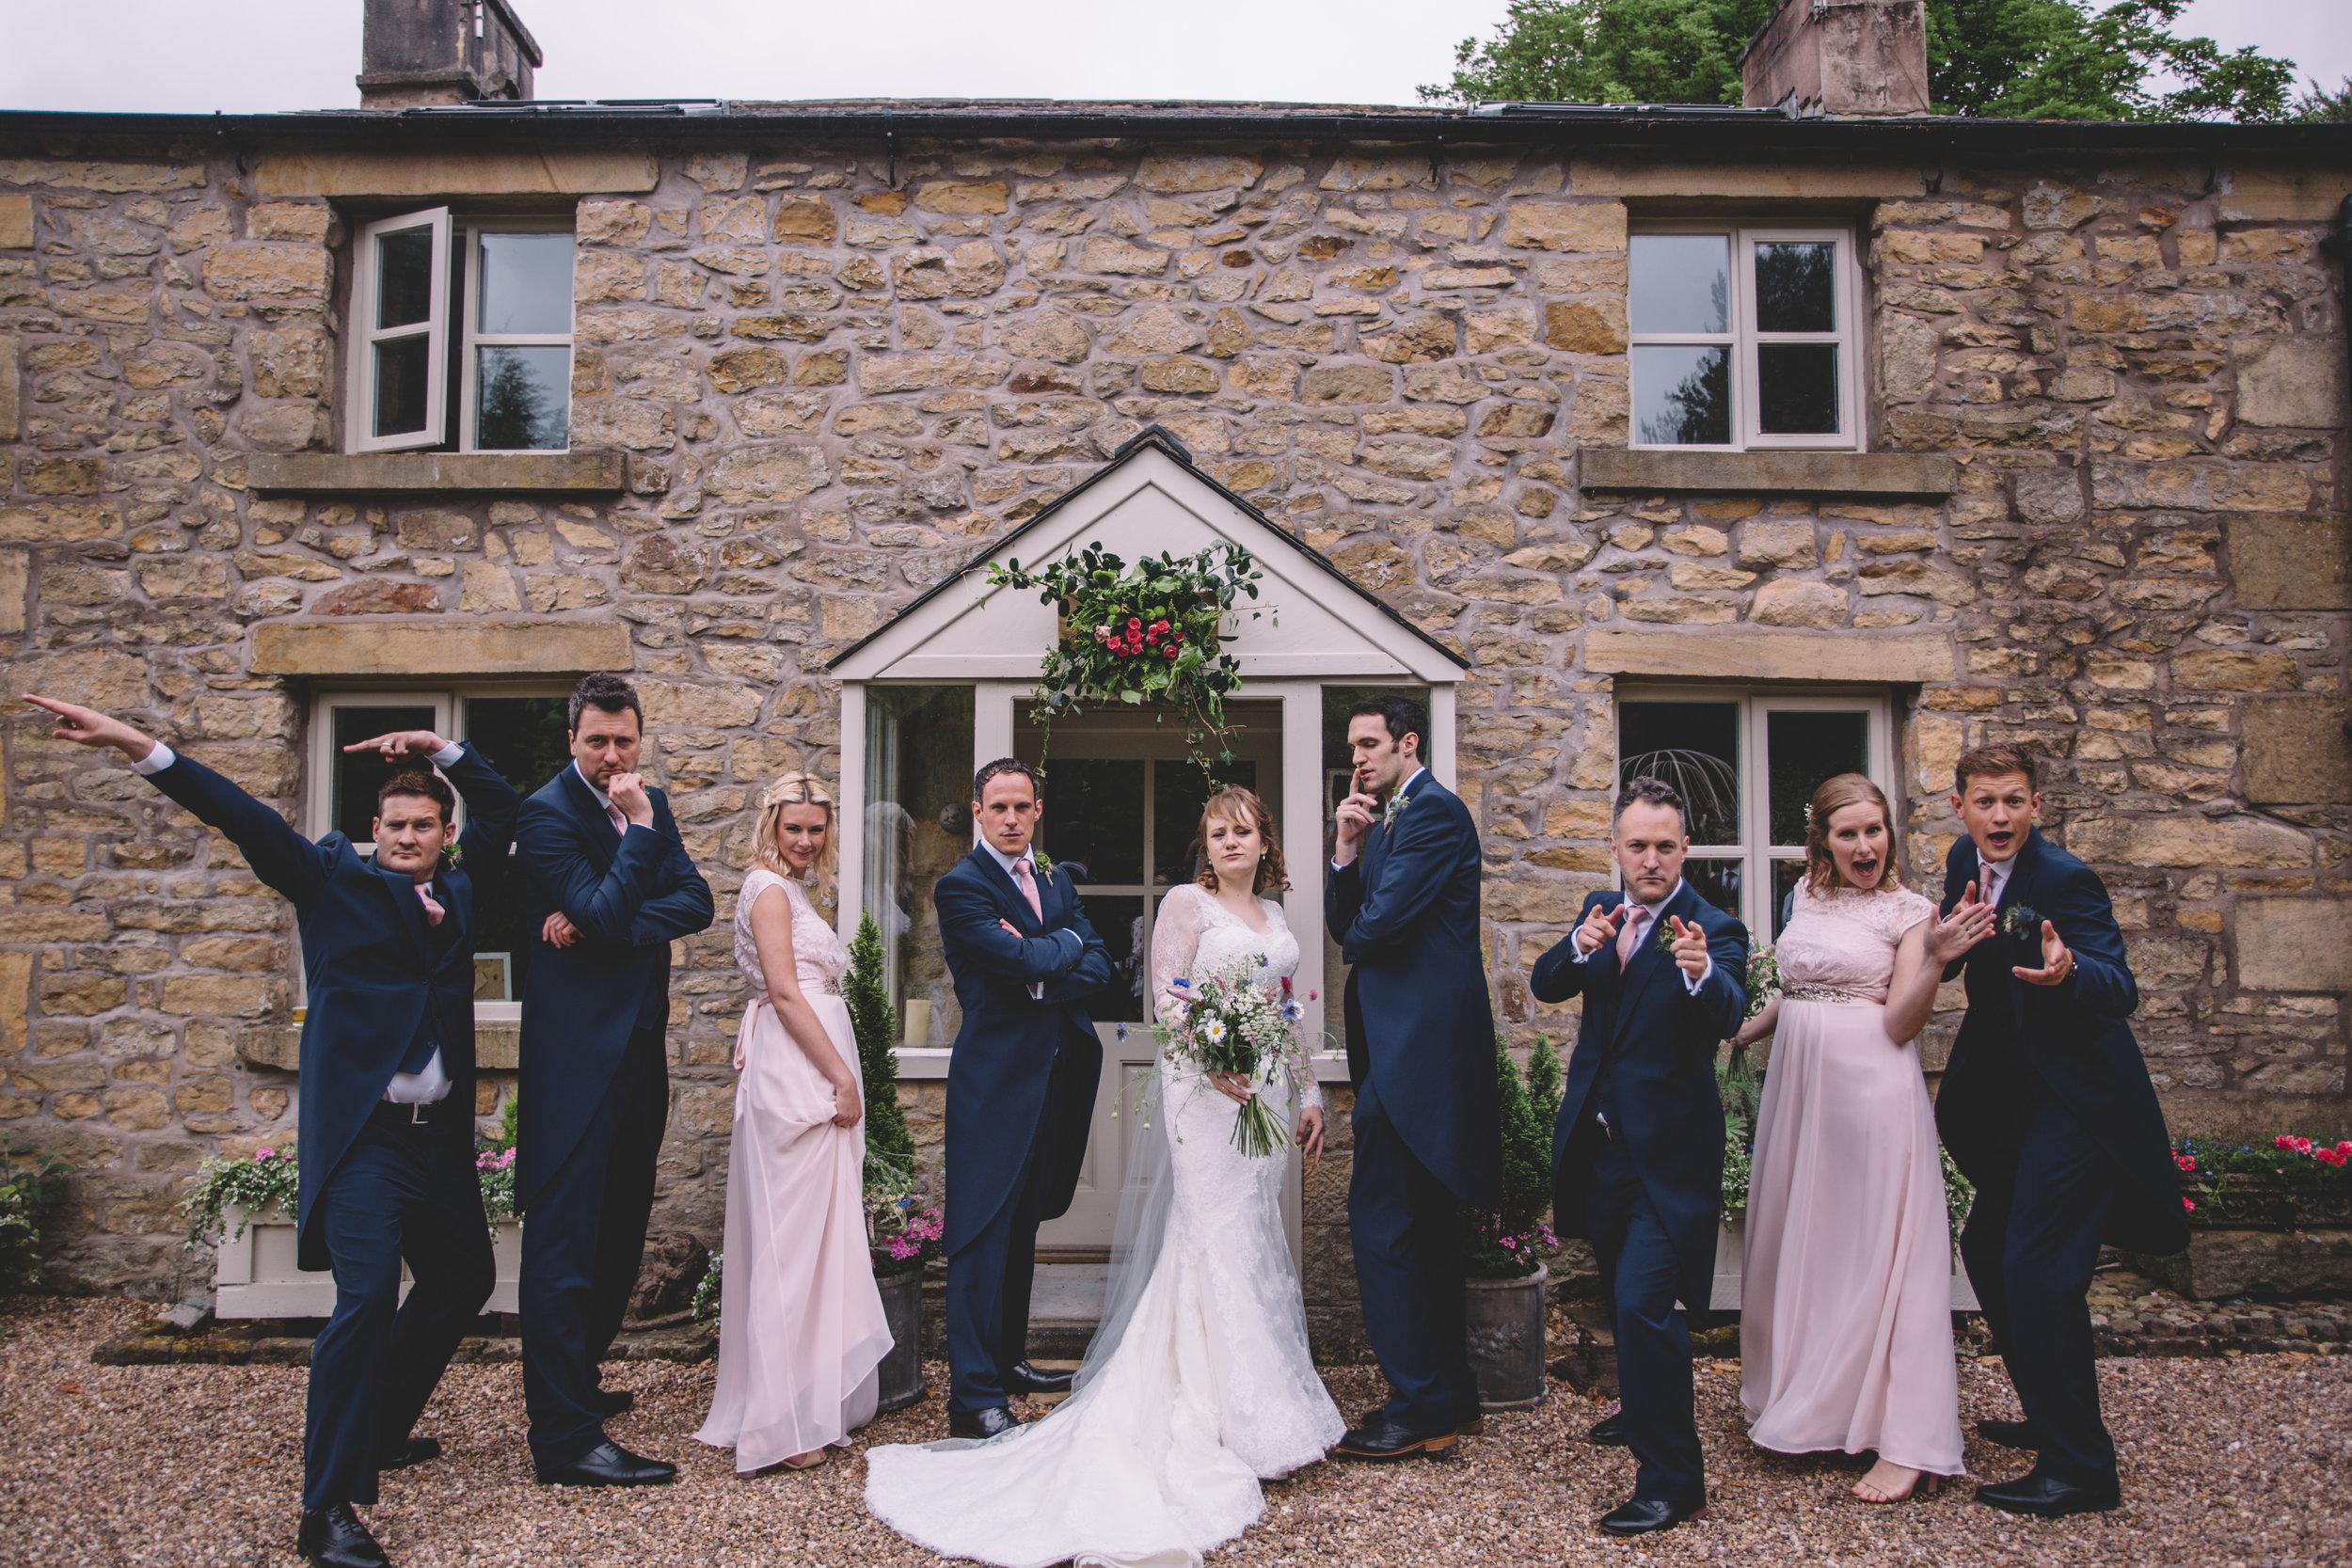 Garden Marquee Lancashire Wedding Photographer, Claire Basiuk Photography-34.jpg